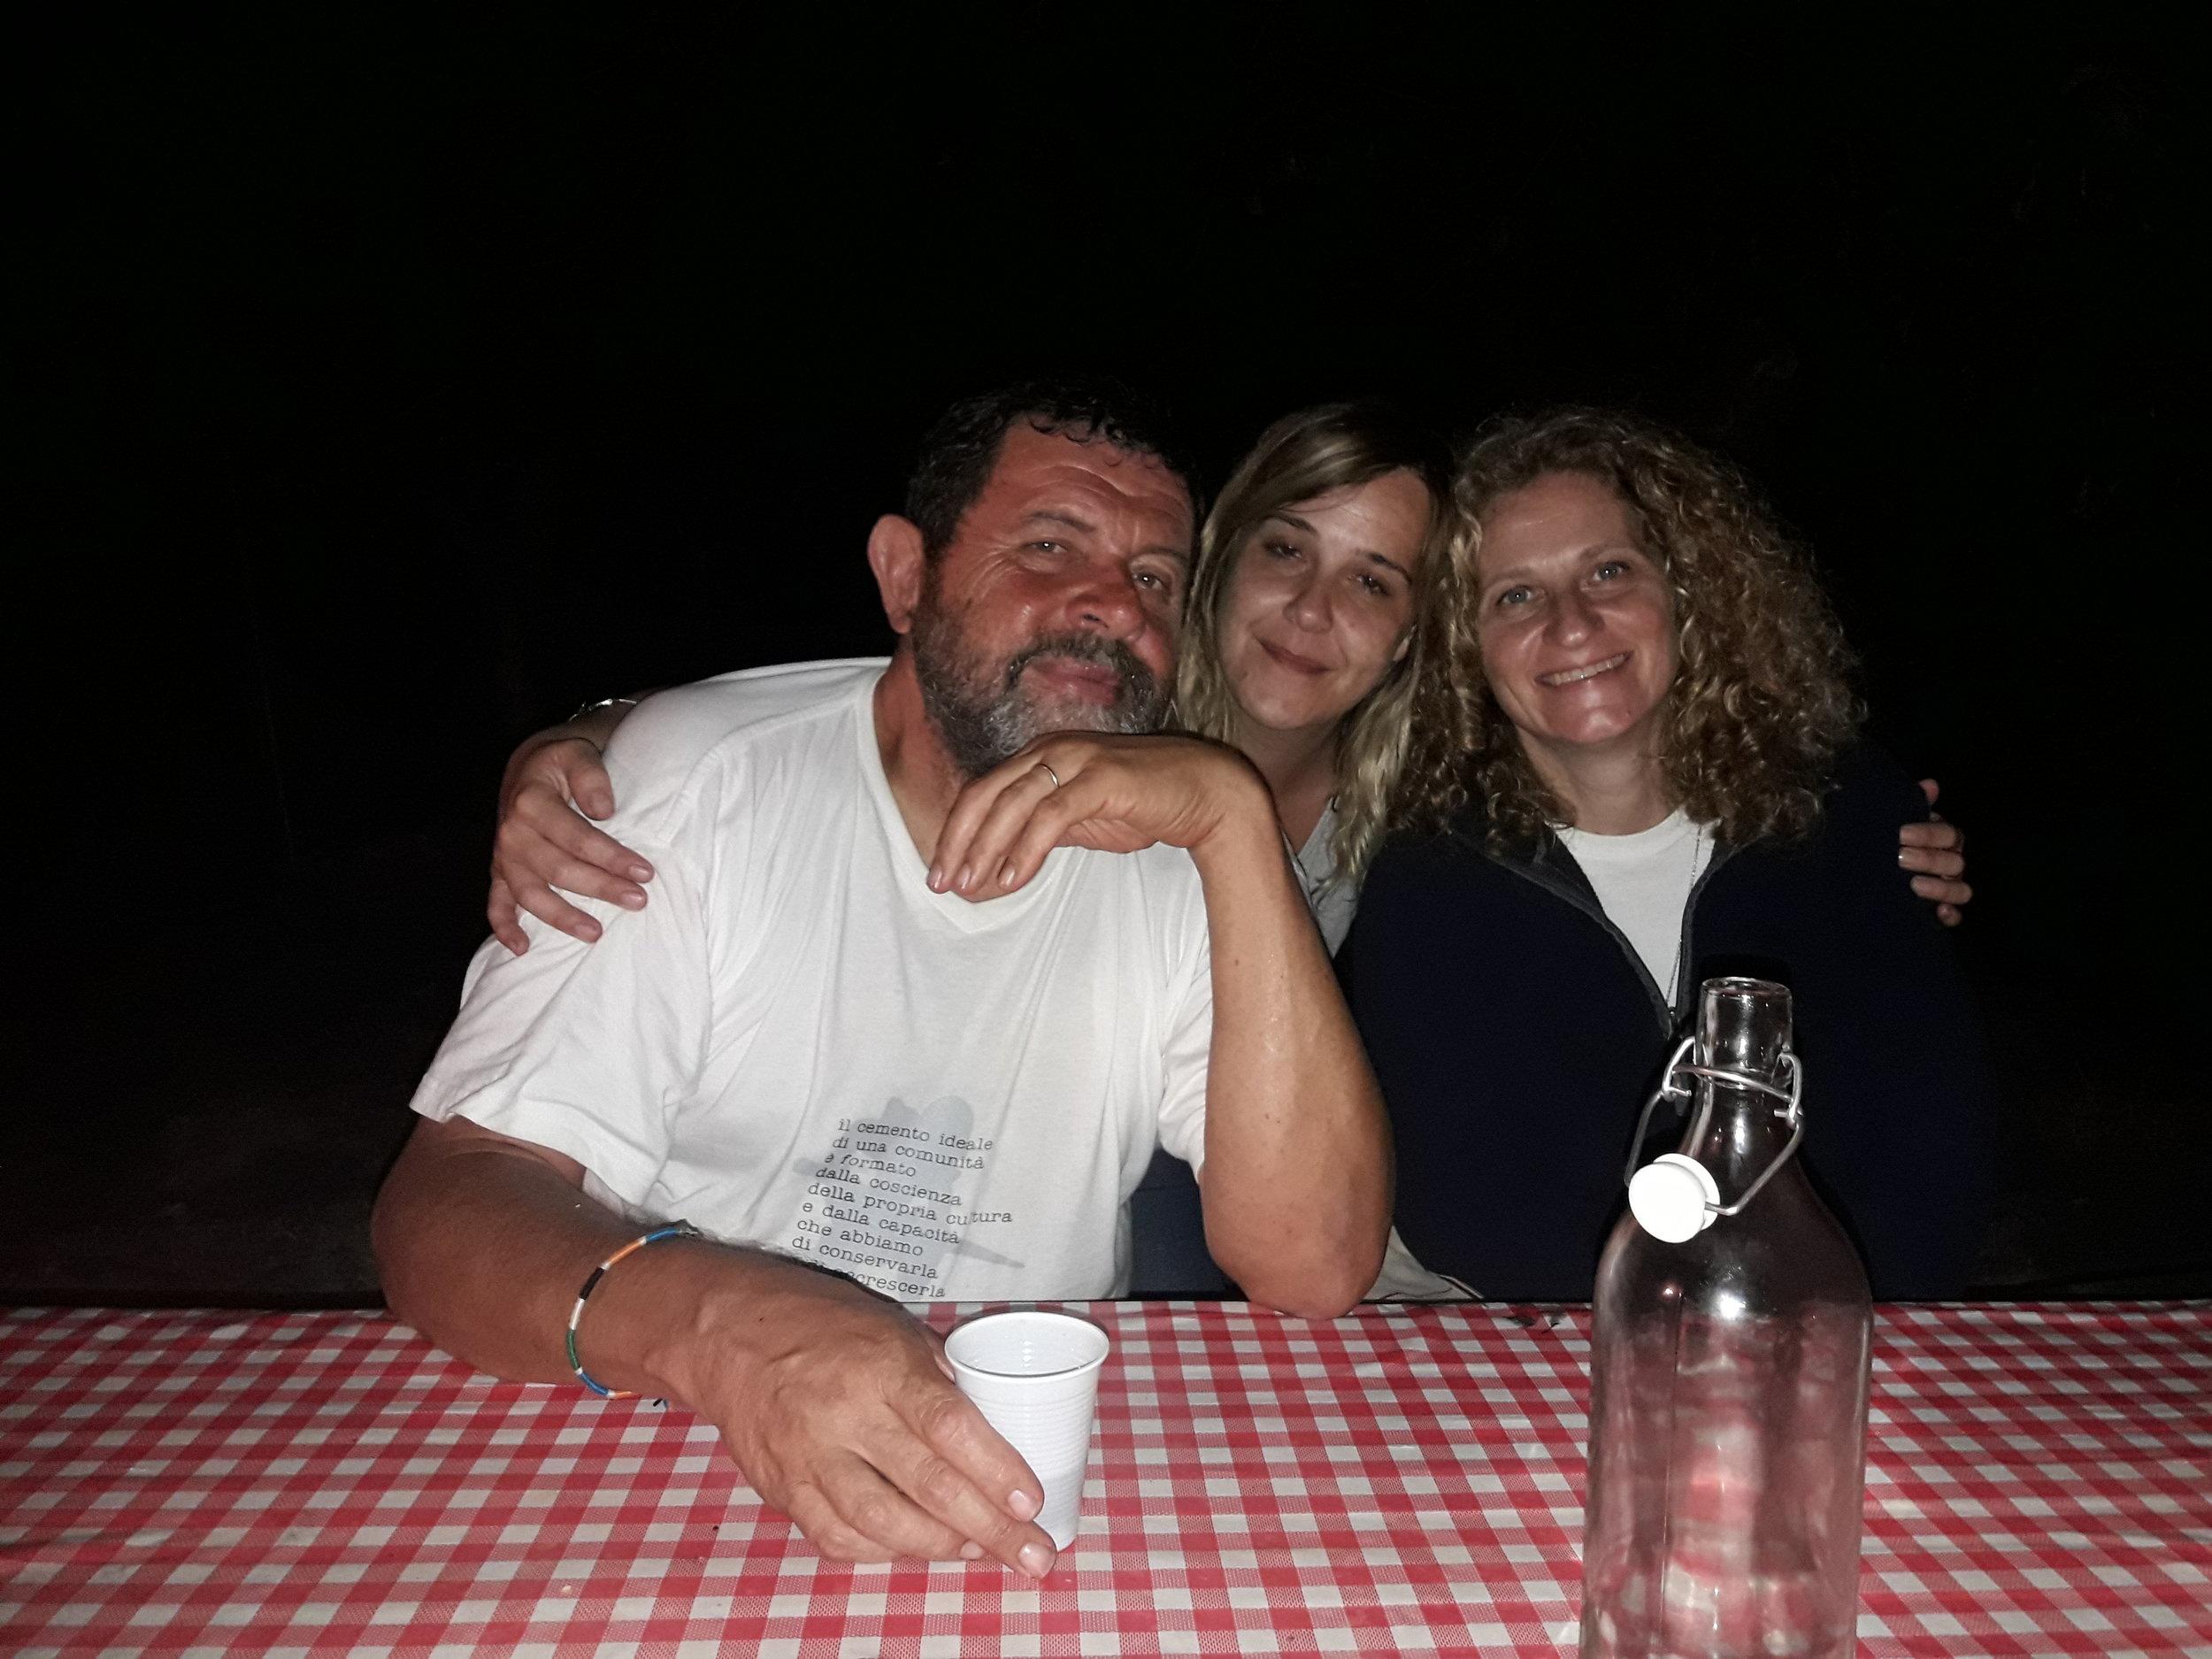 20180804_230611 Gianfranco, Angela, Cristiana ago18.jpg